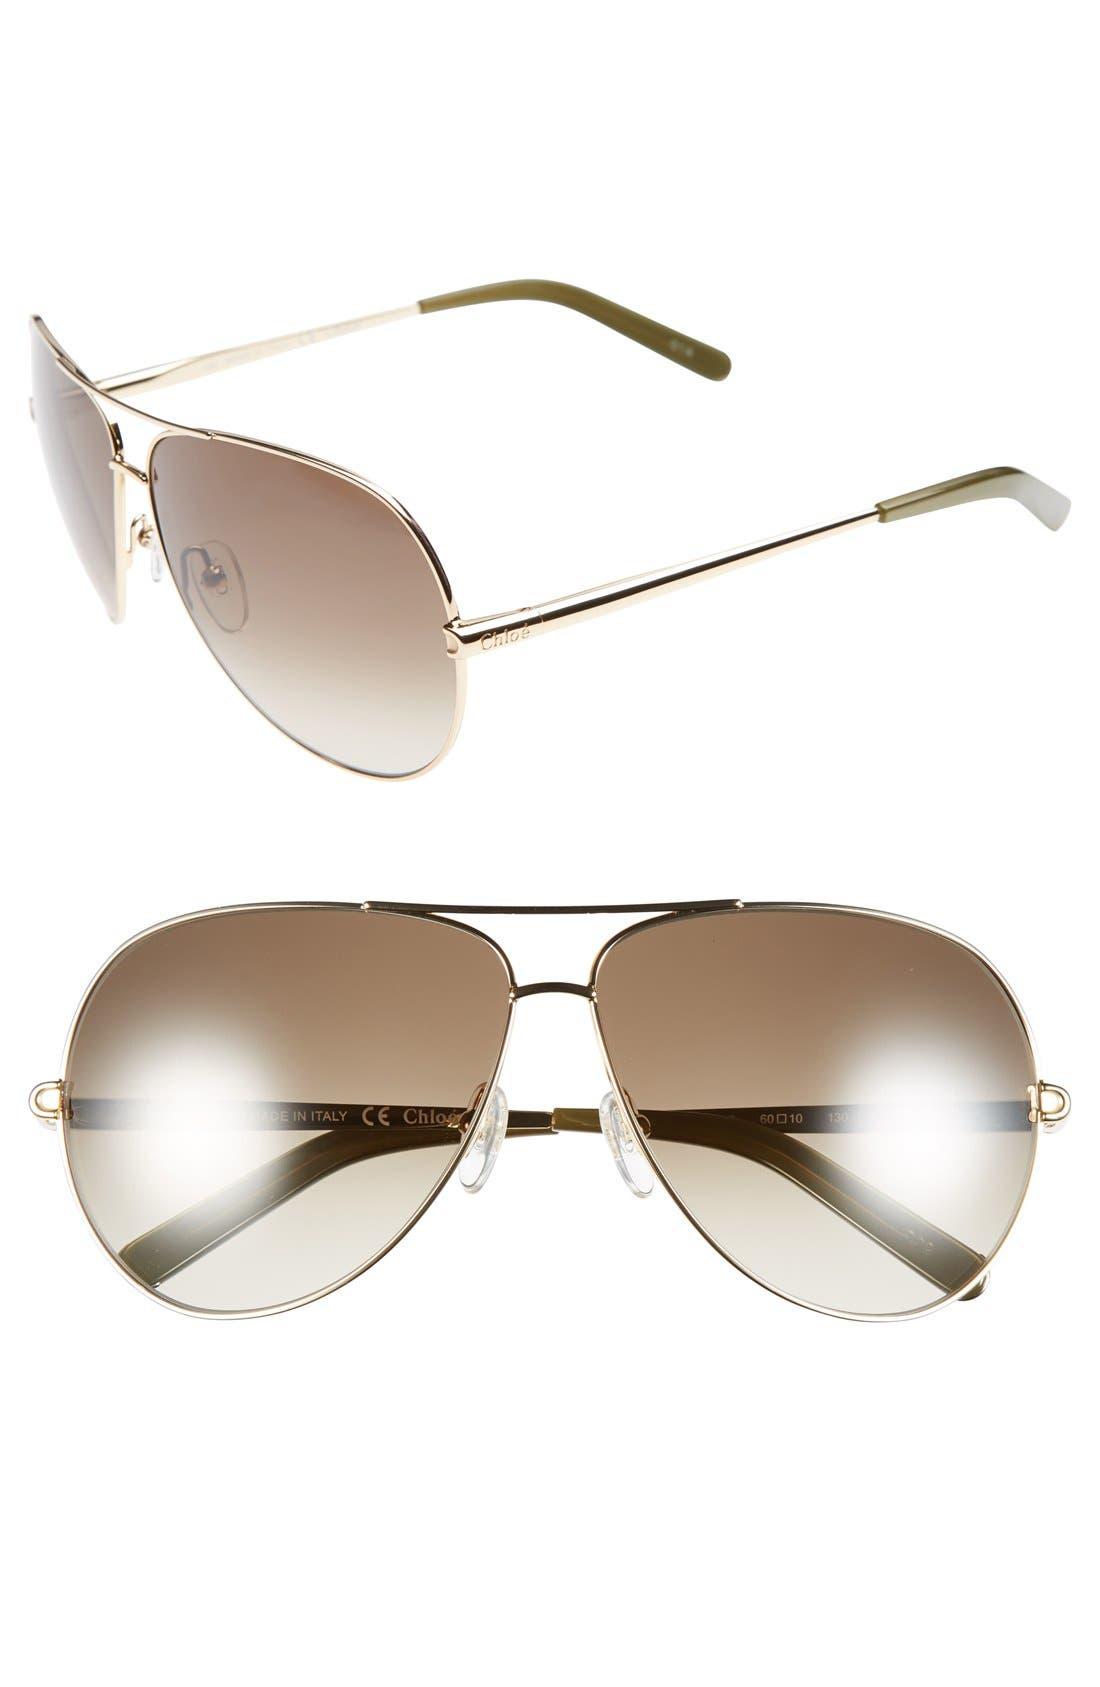 Alternate Image 1 Selected - Chloé 'Orme' 60mm Sunglasses